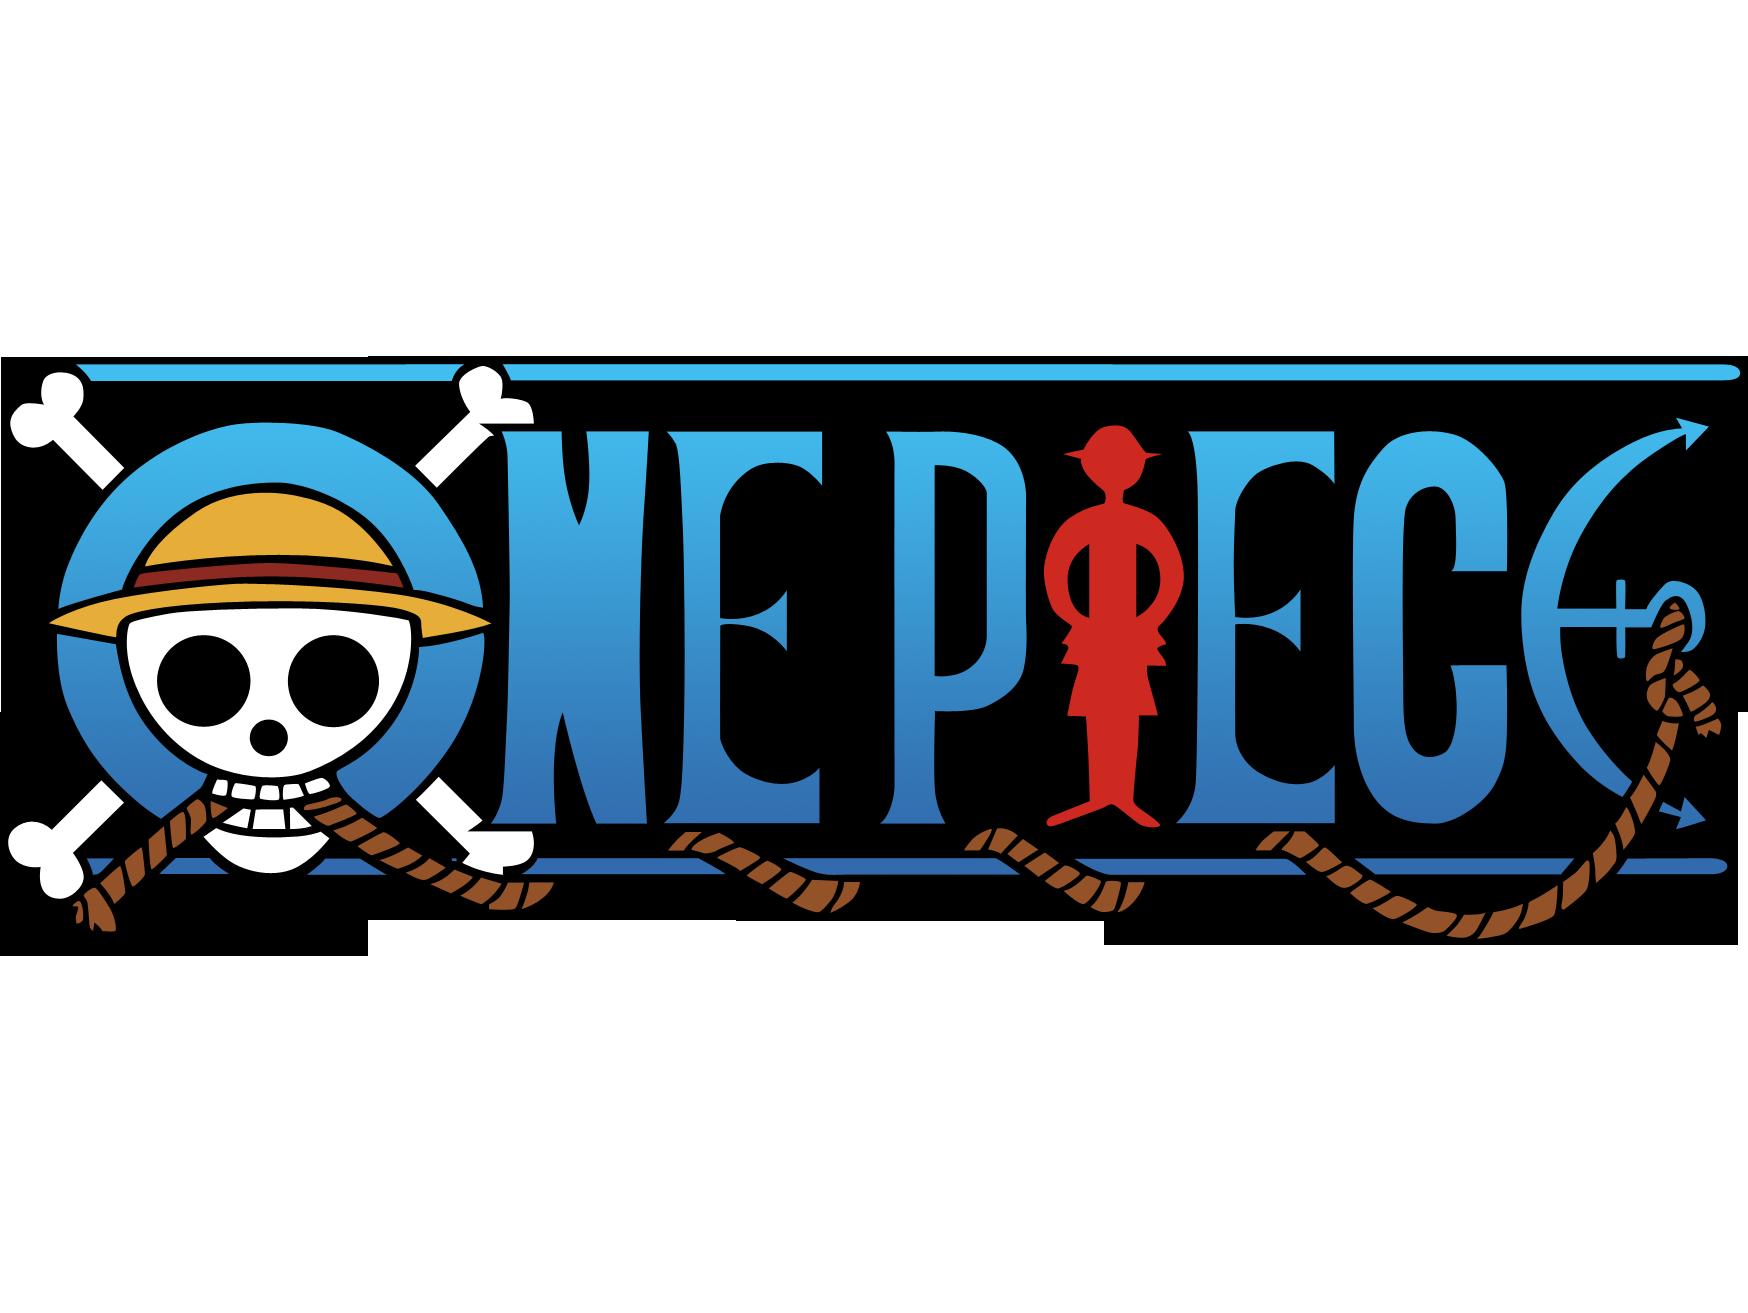 One Piece Logo Logospike Com Famous And Free Vector Logos Desain Logo Gambar Stiker